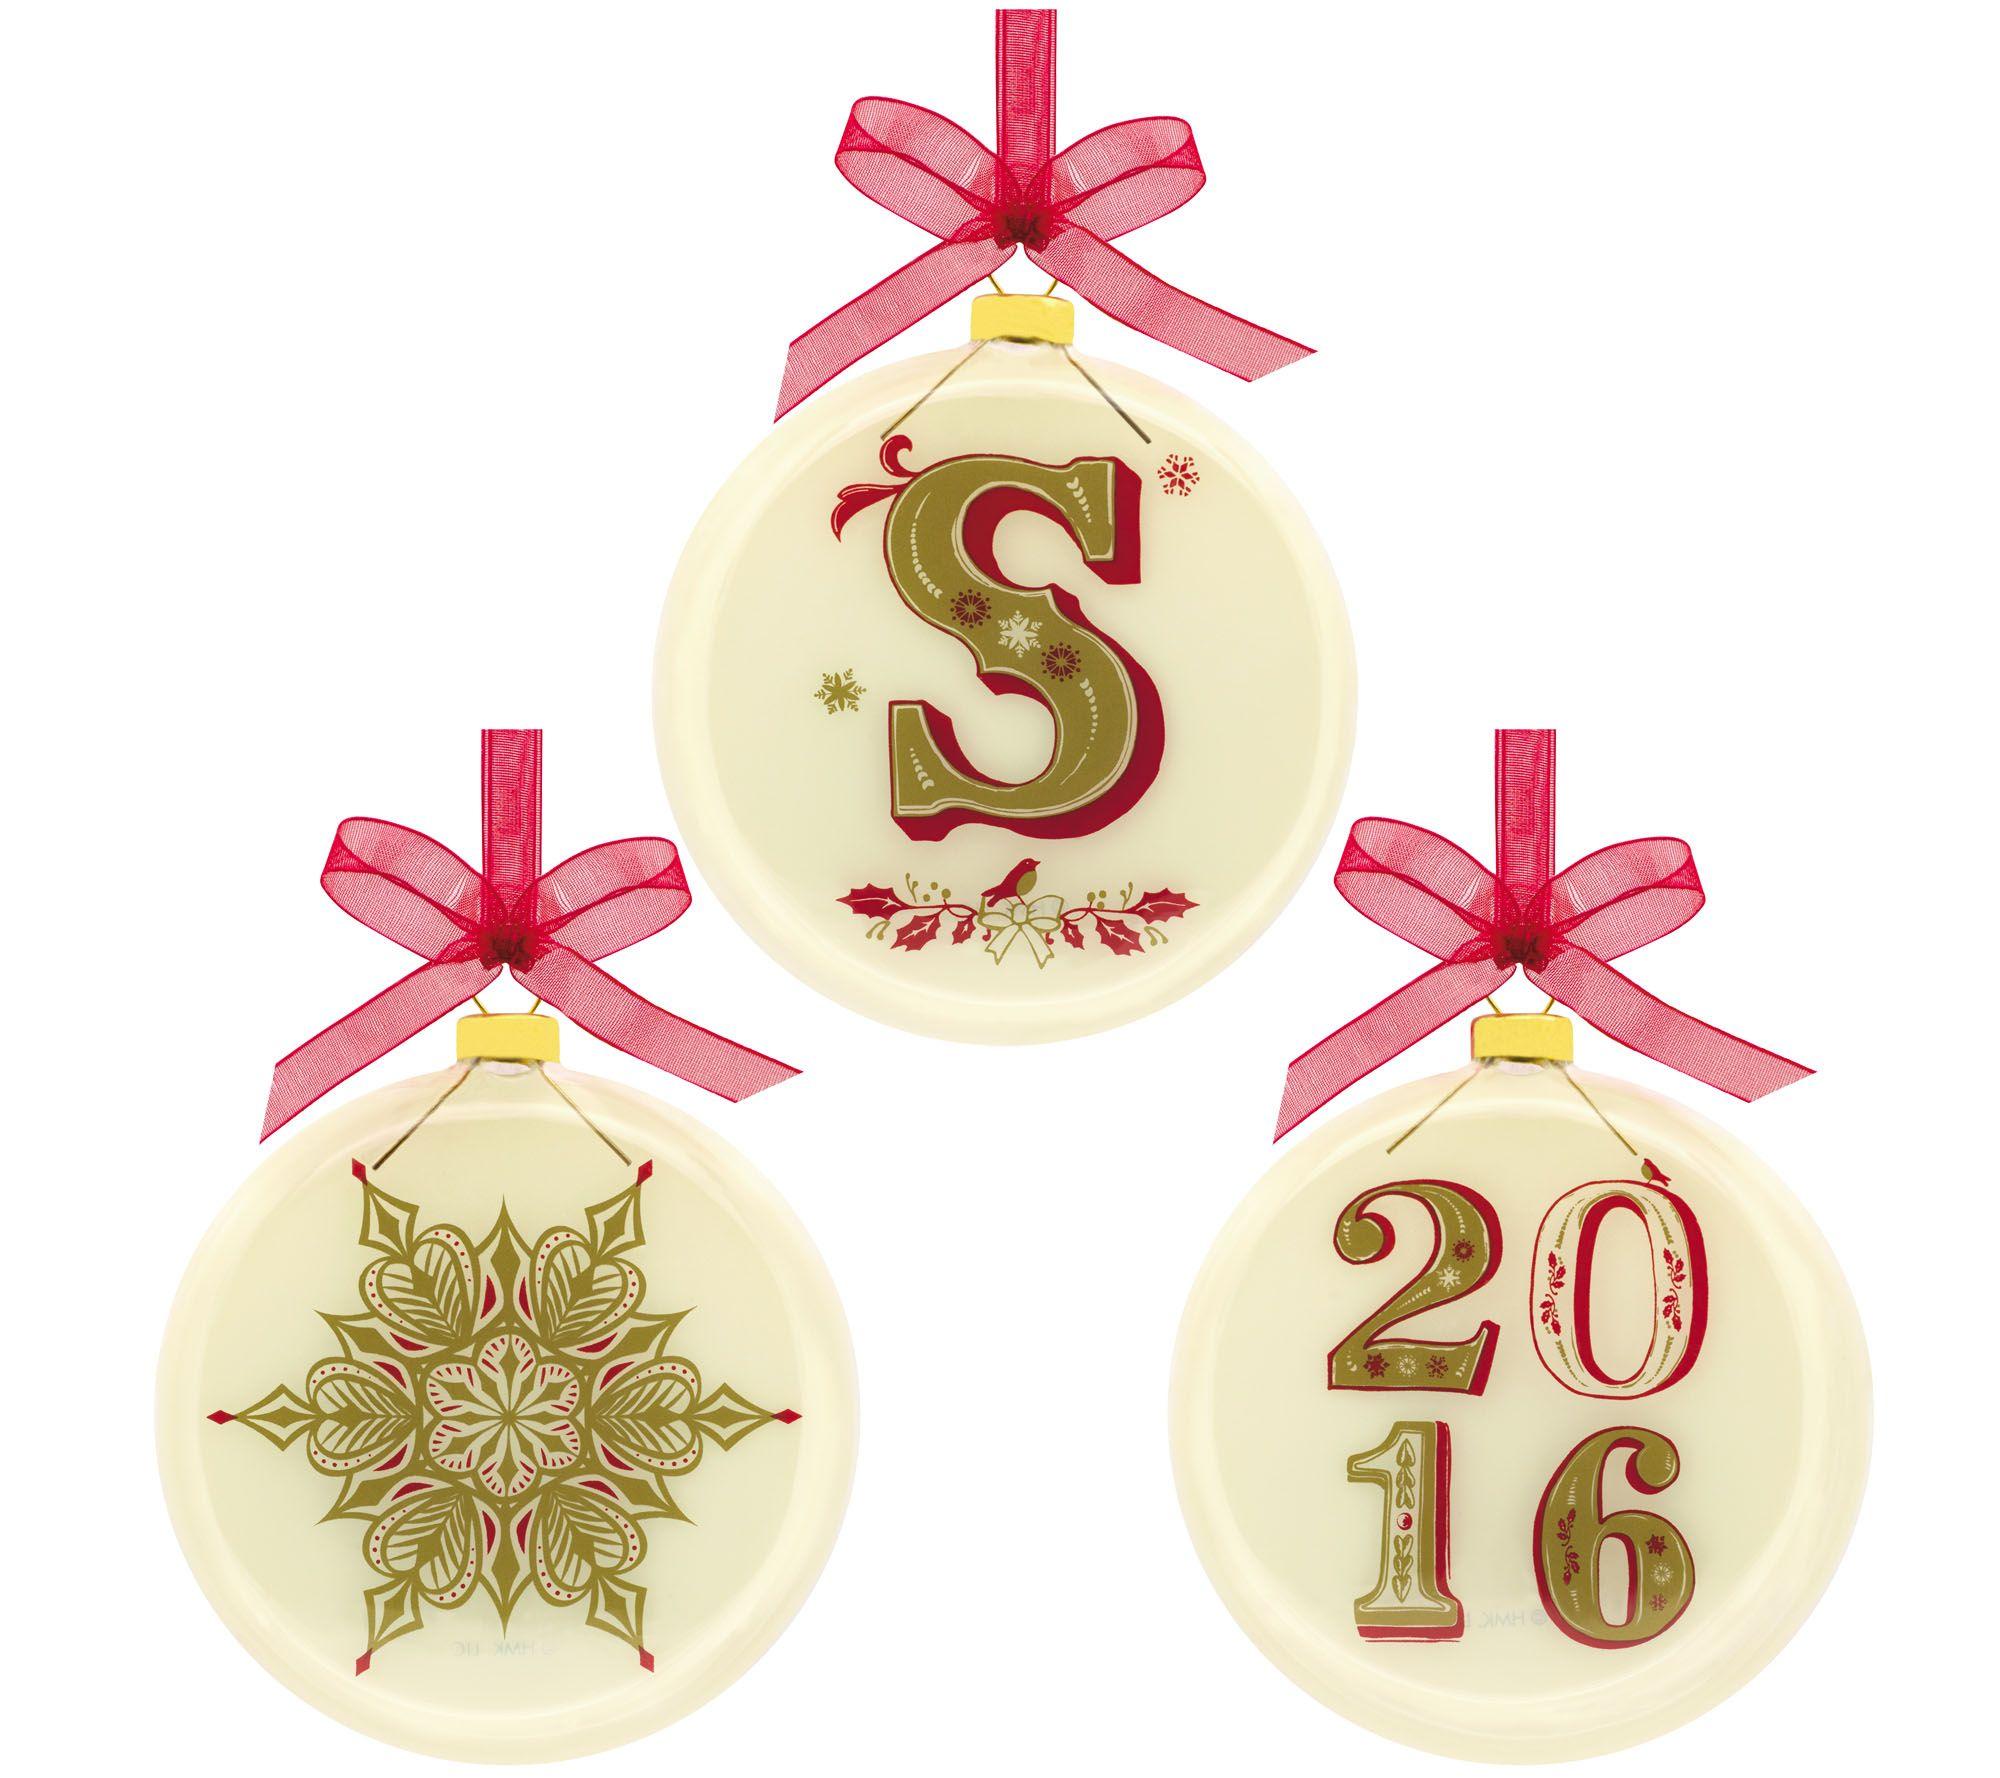 Hallmark — Ornaments, Etc. — Christmas — Holiday — For the Home ...